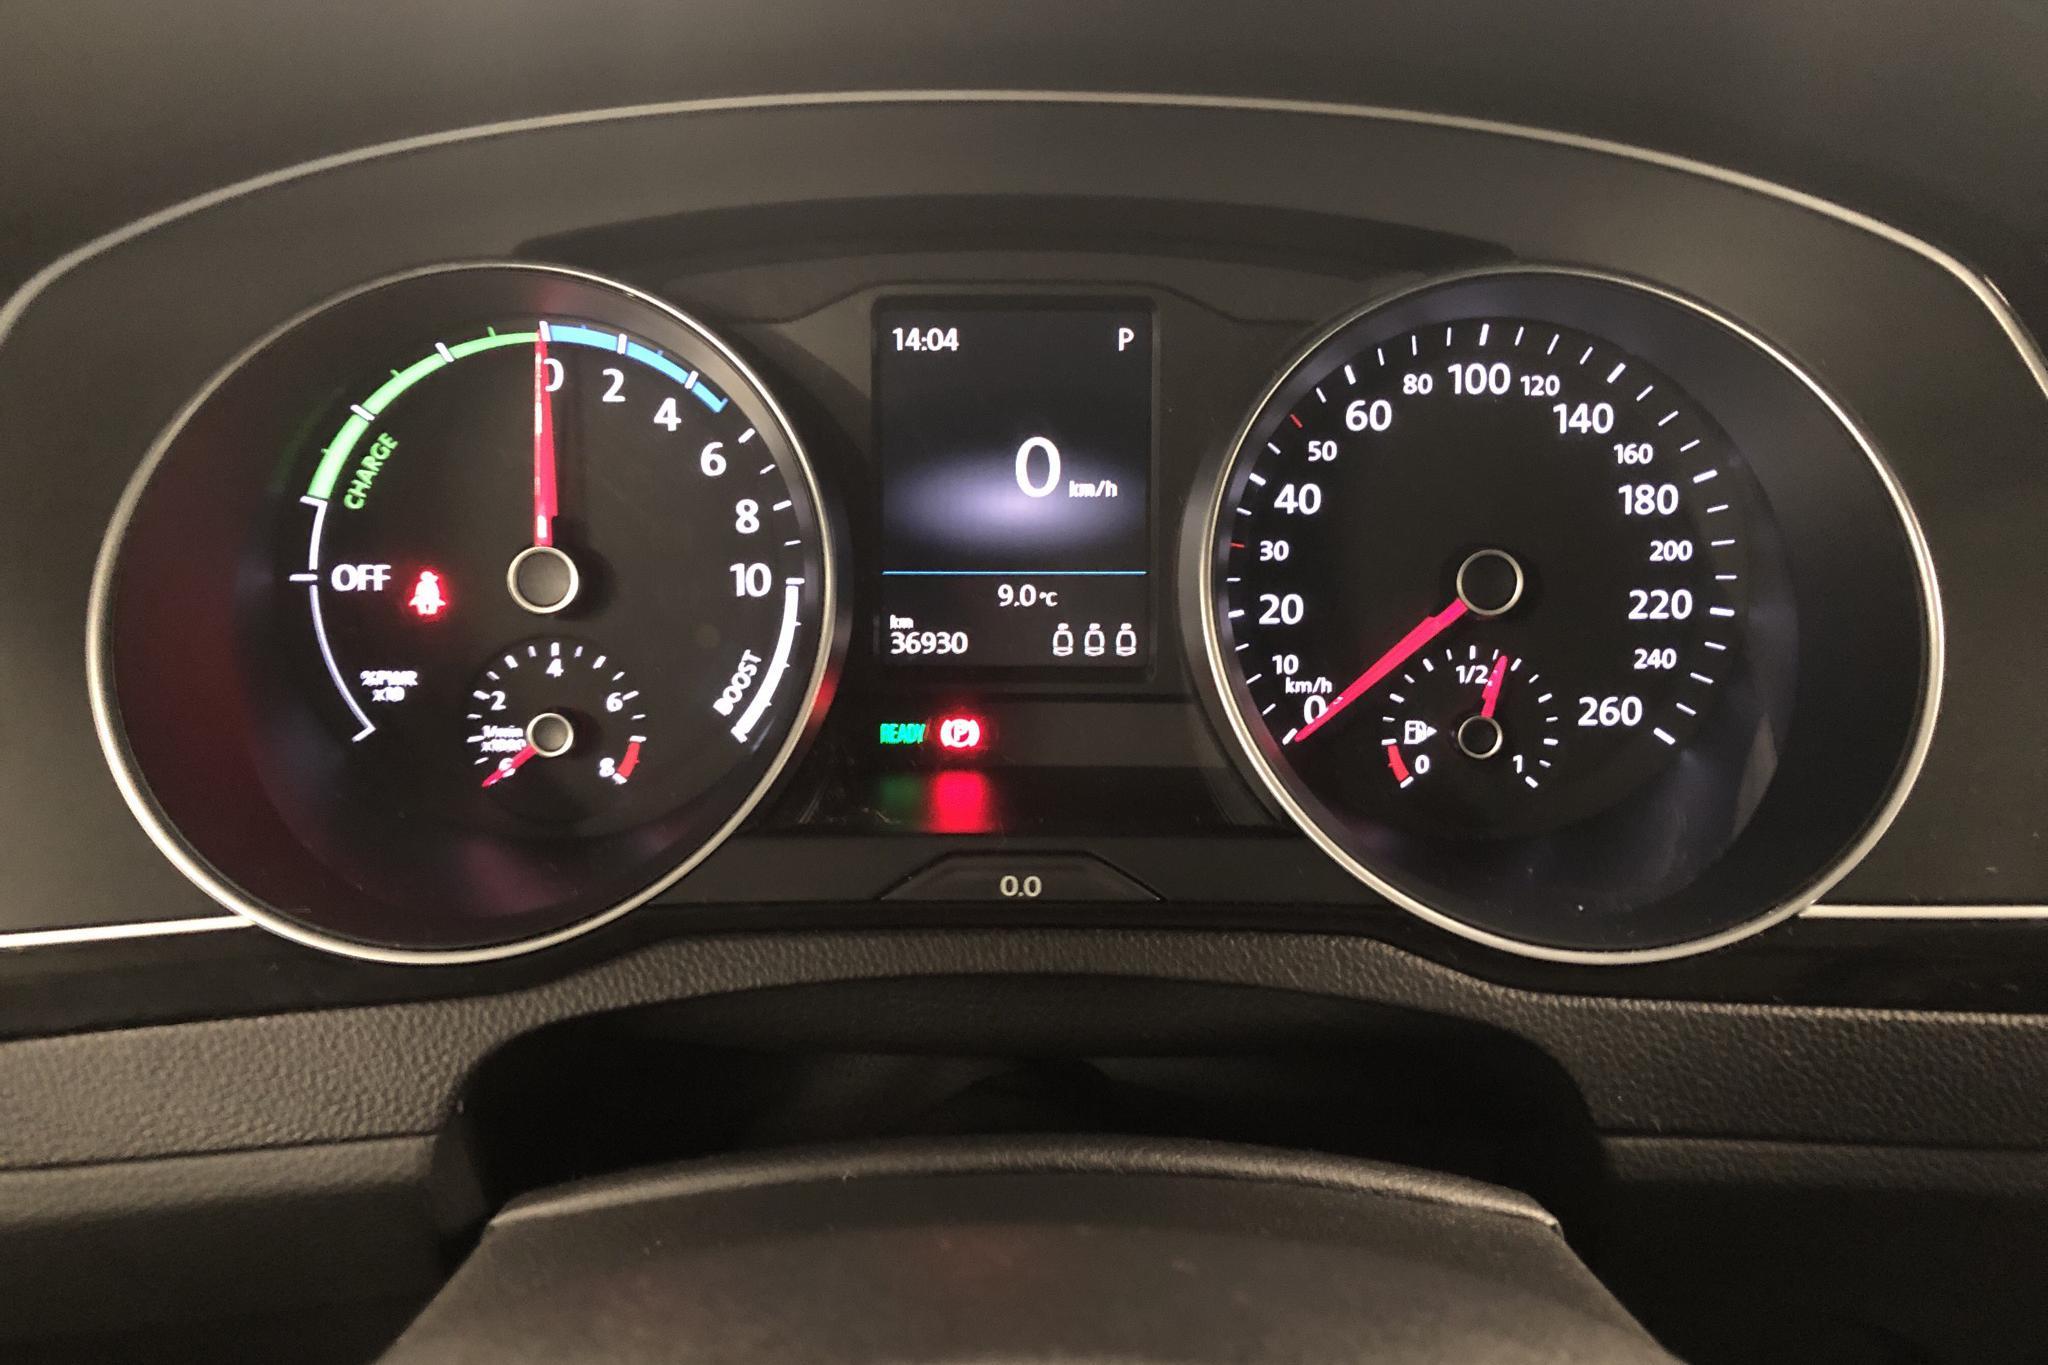 VW Passat 1.4 Plug-in-Hybrid (218hk) - 36 940 km - Automatic - silver - 2017